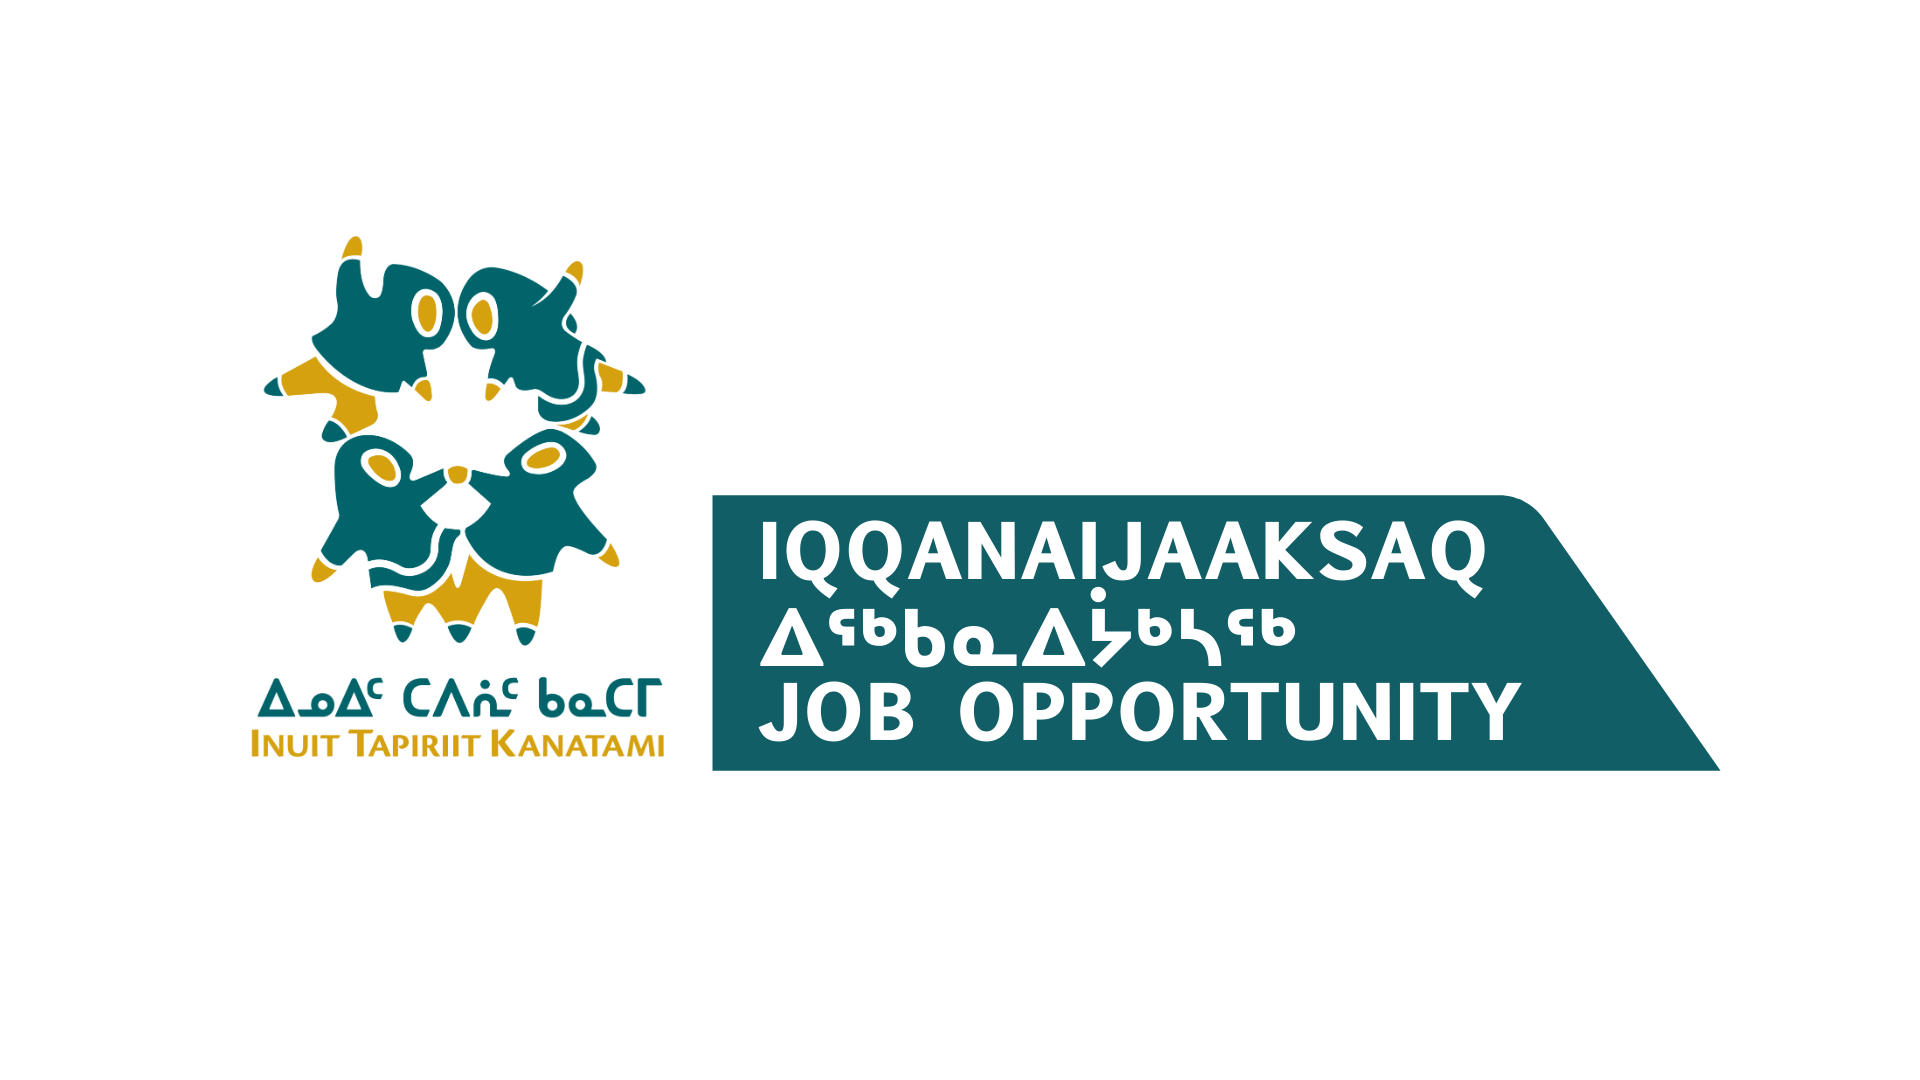 Manager – Education, Economic Development and Culture — Inuit Tapiriit Kanatami